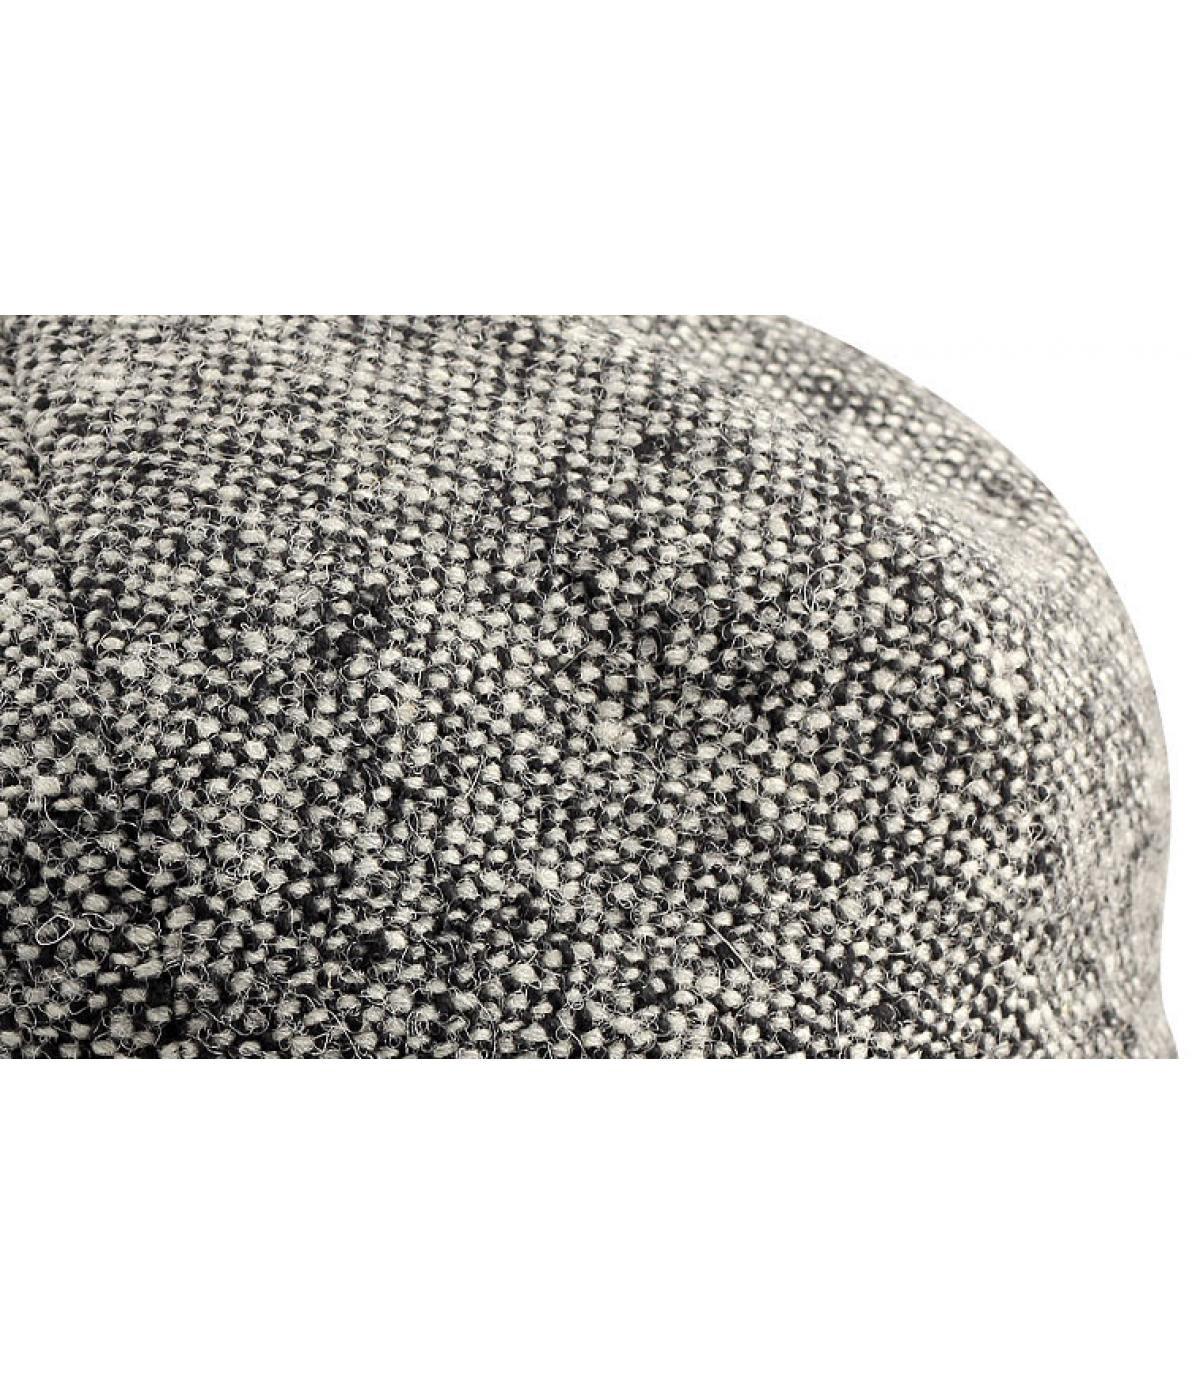 Dettagli Hatteras Donegal gris - image 2